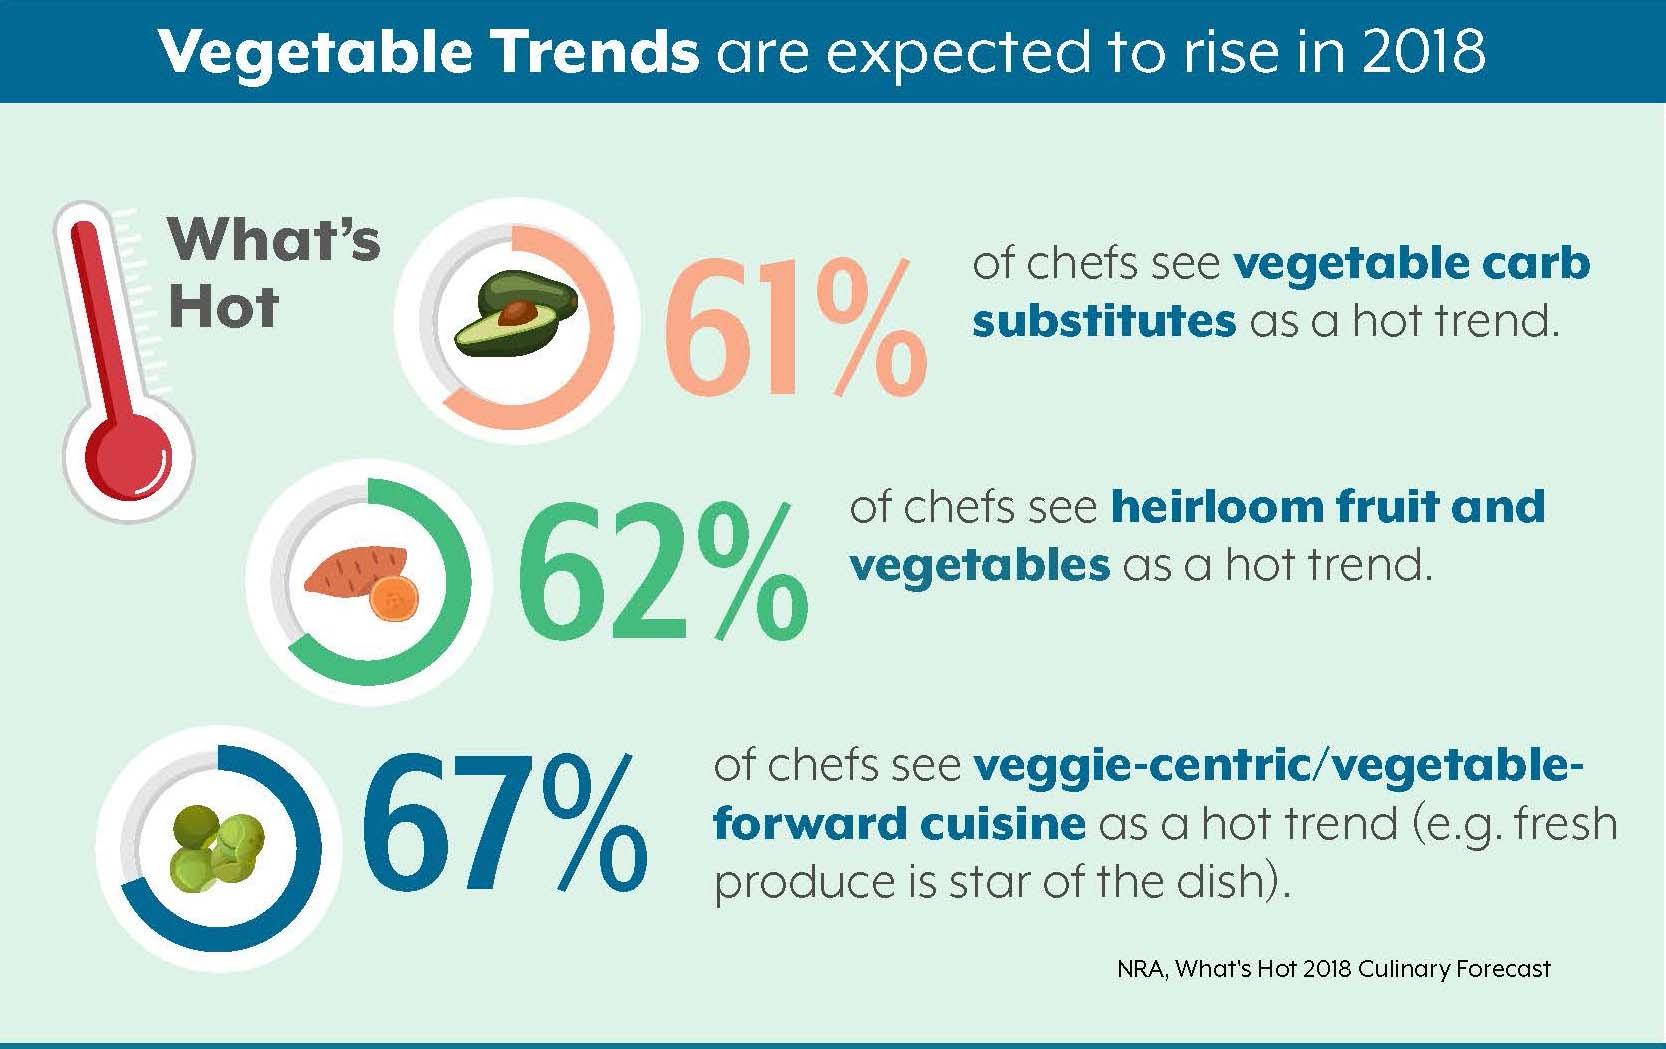 Vegetable trends